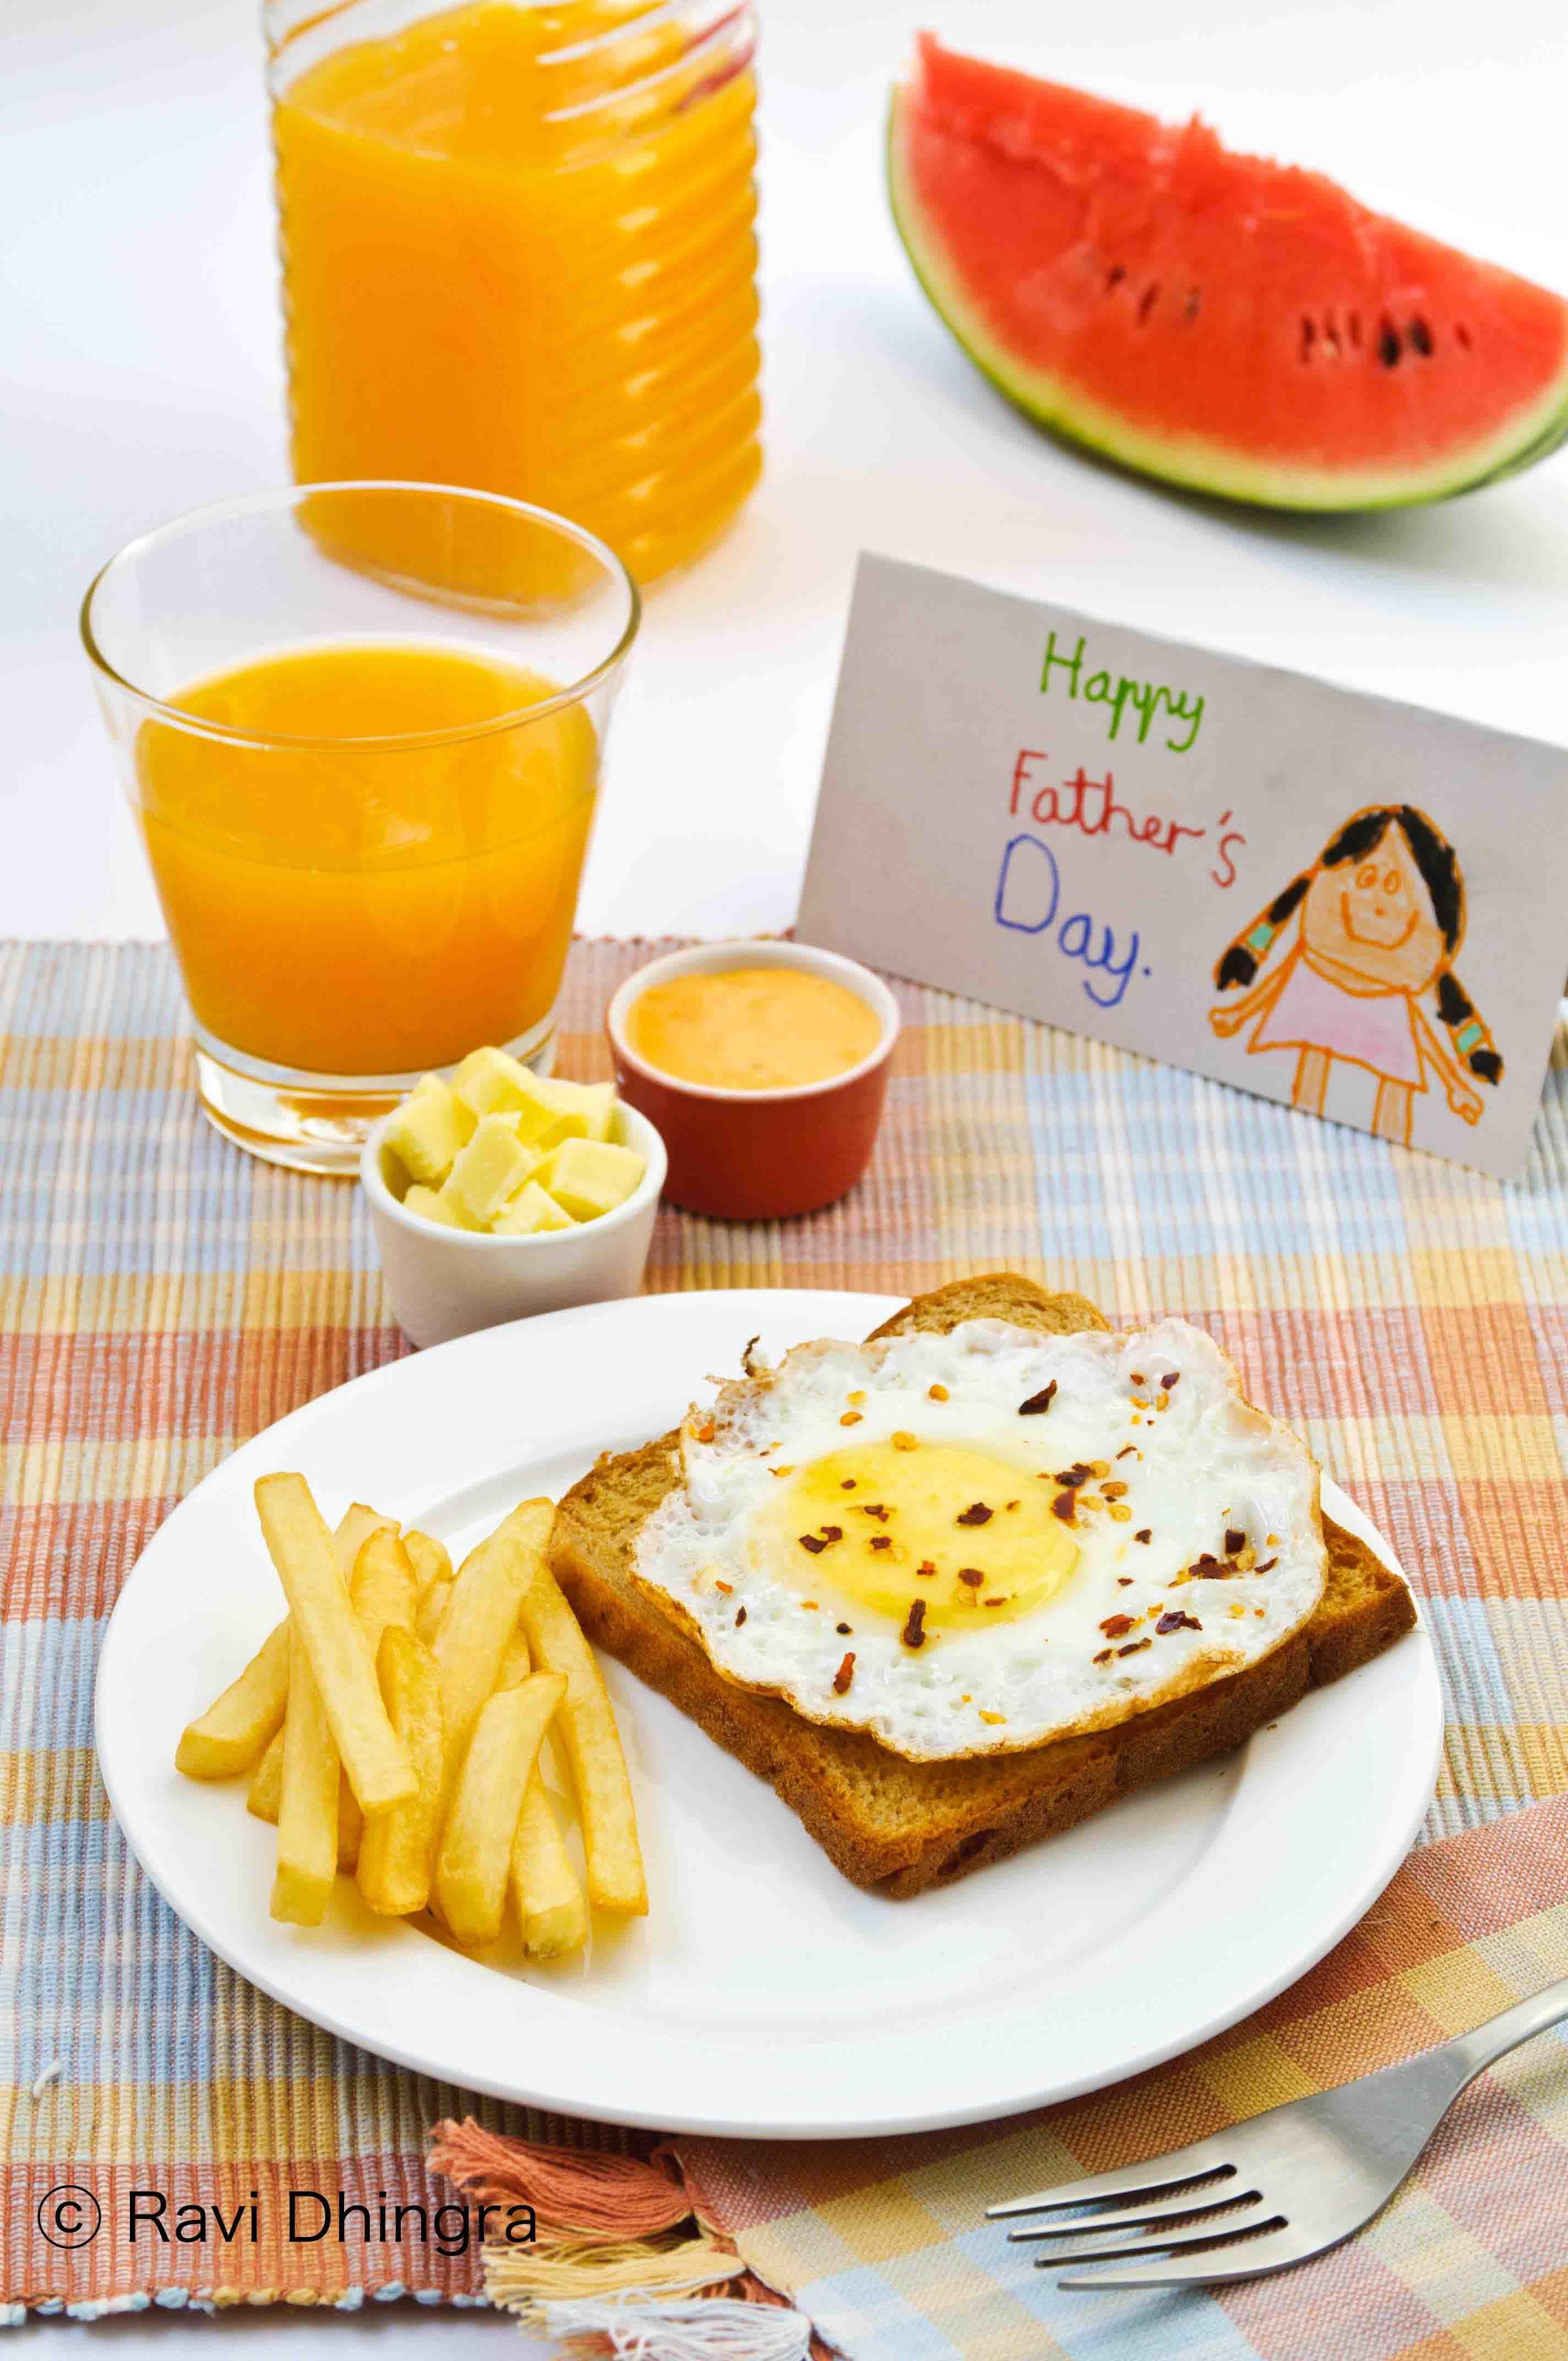 father's day breakfast hamper